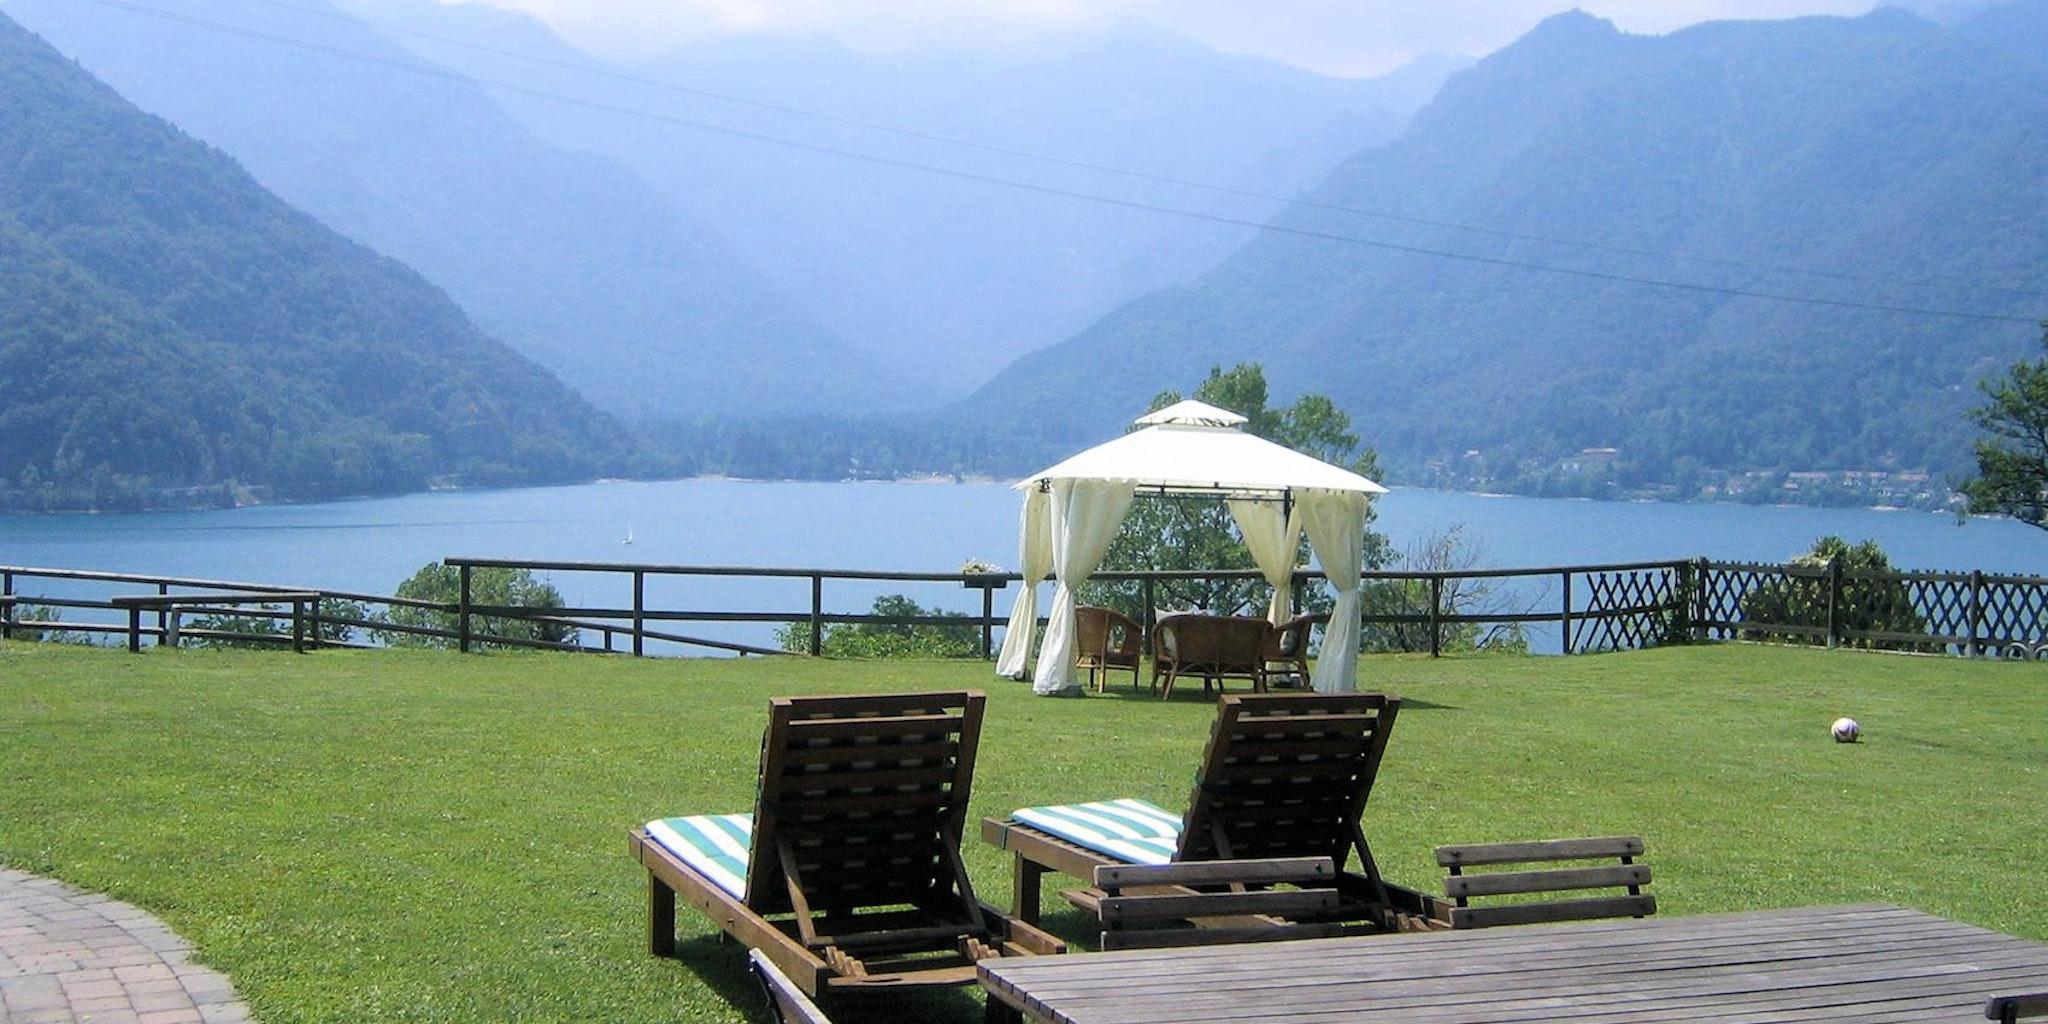 B&B Ai Casai, relax en bord de lac